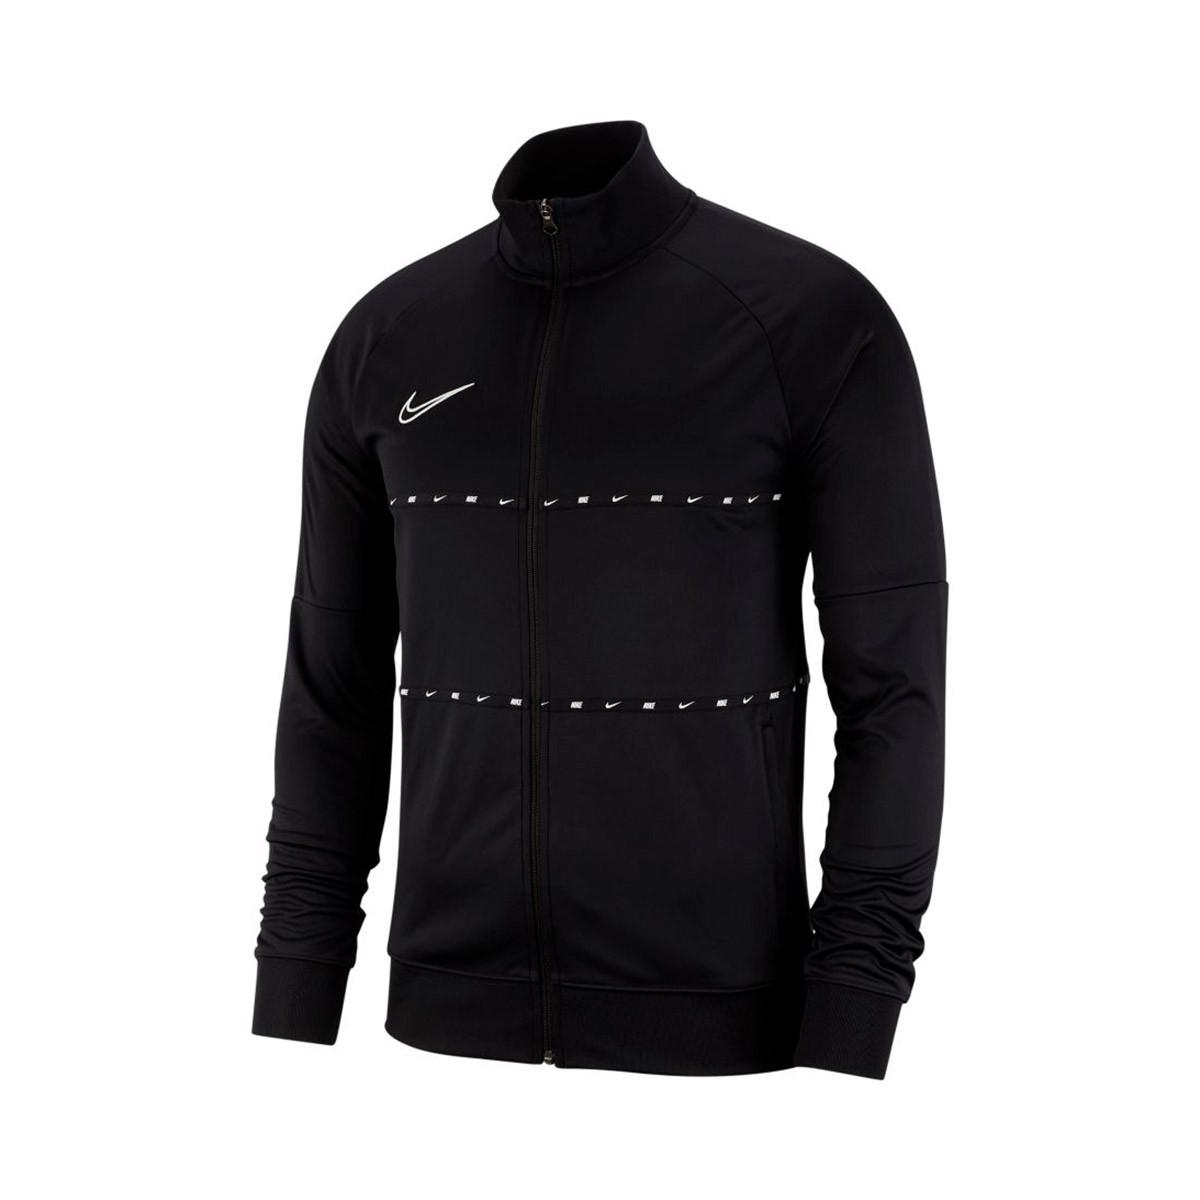 Casaco Nike Dry Academy I96 GX